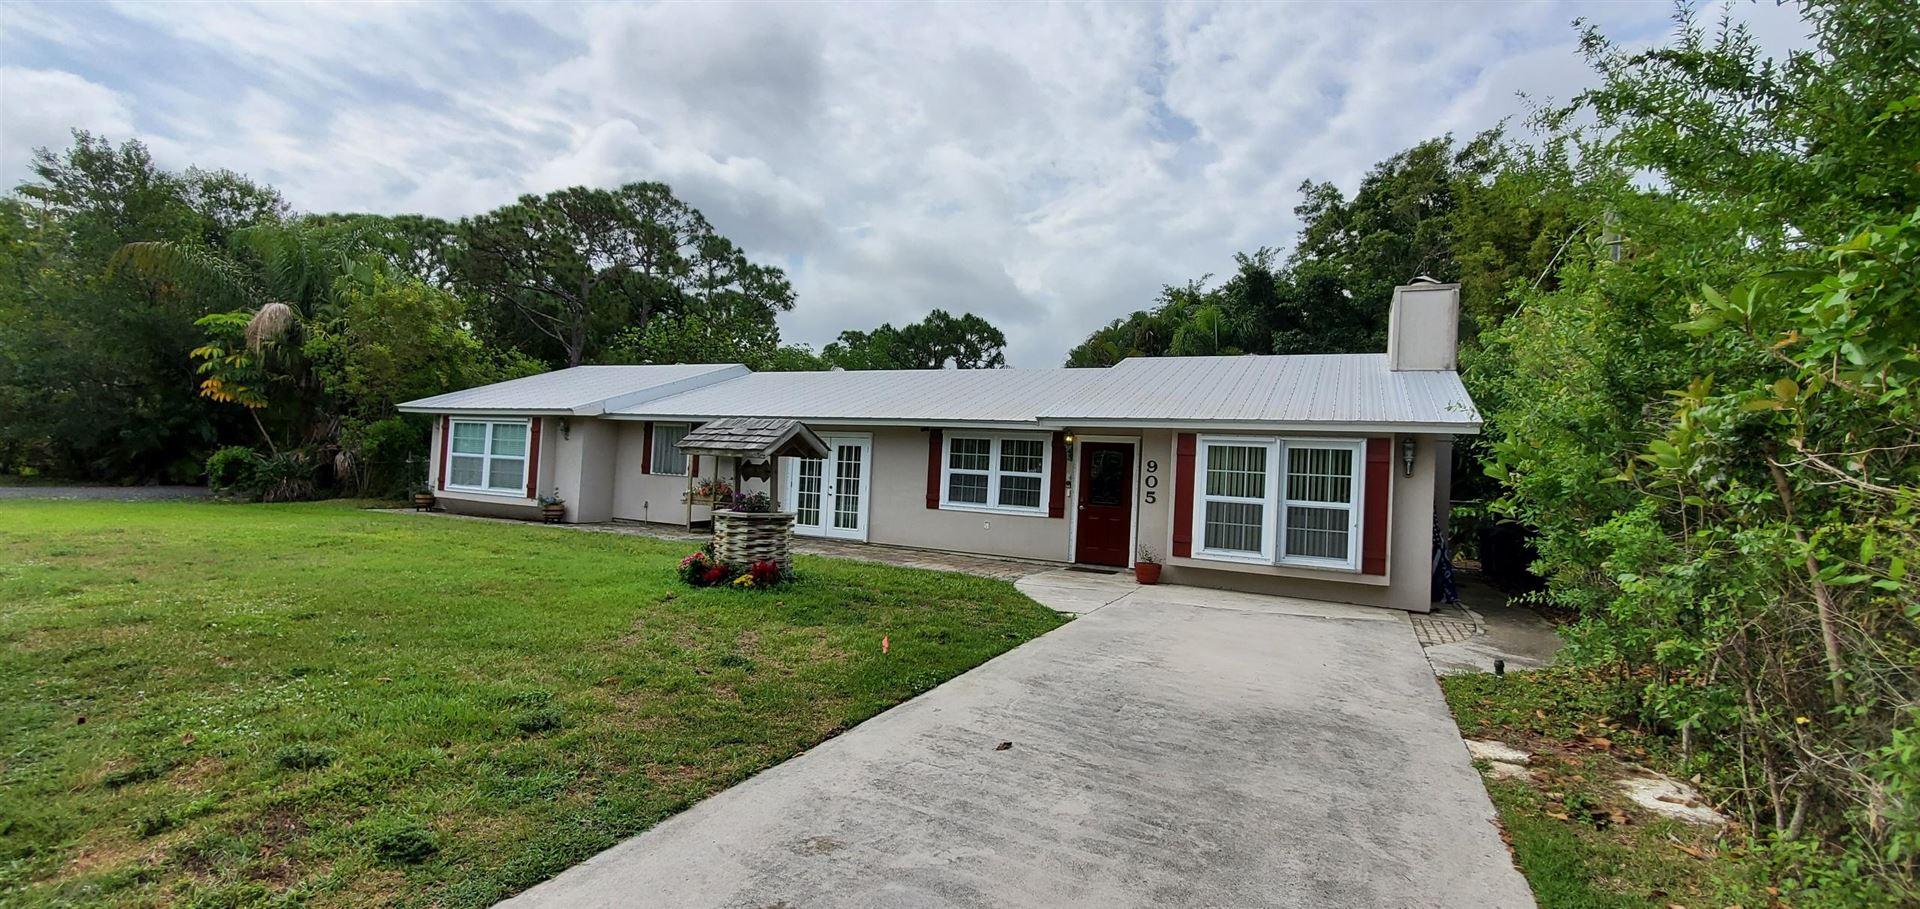 905 E Easy Street, Fort Pierce, FL 34982 - #: RX-10709833